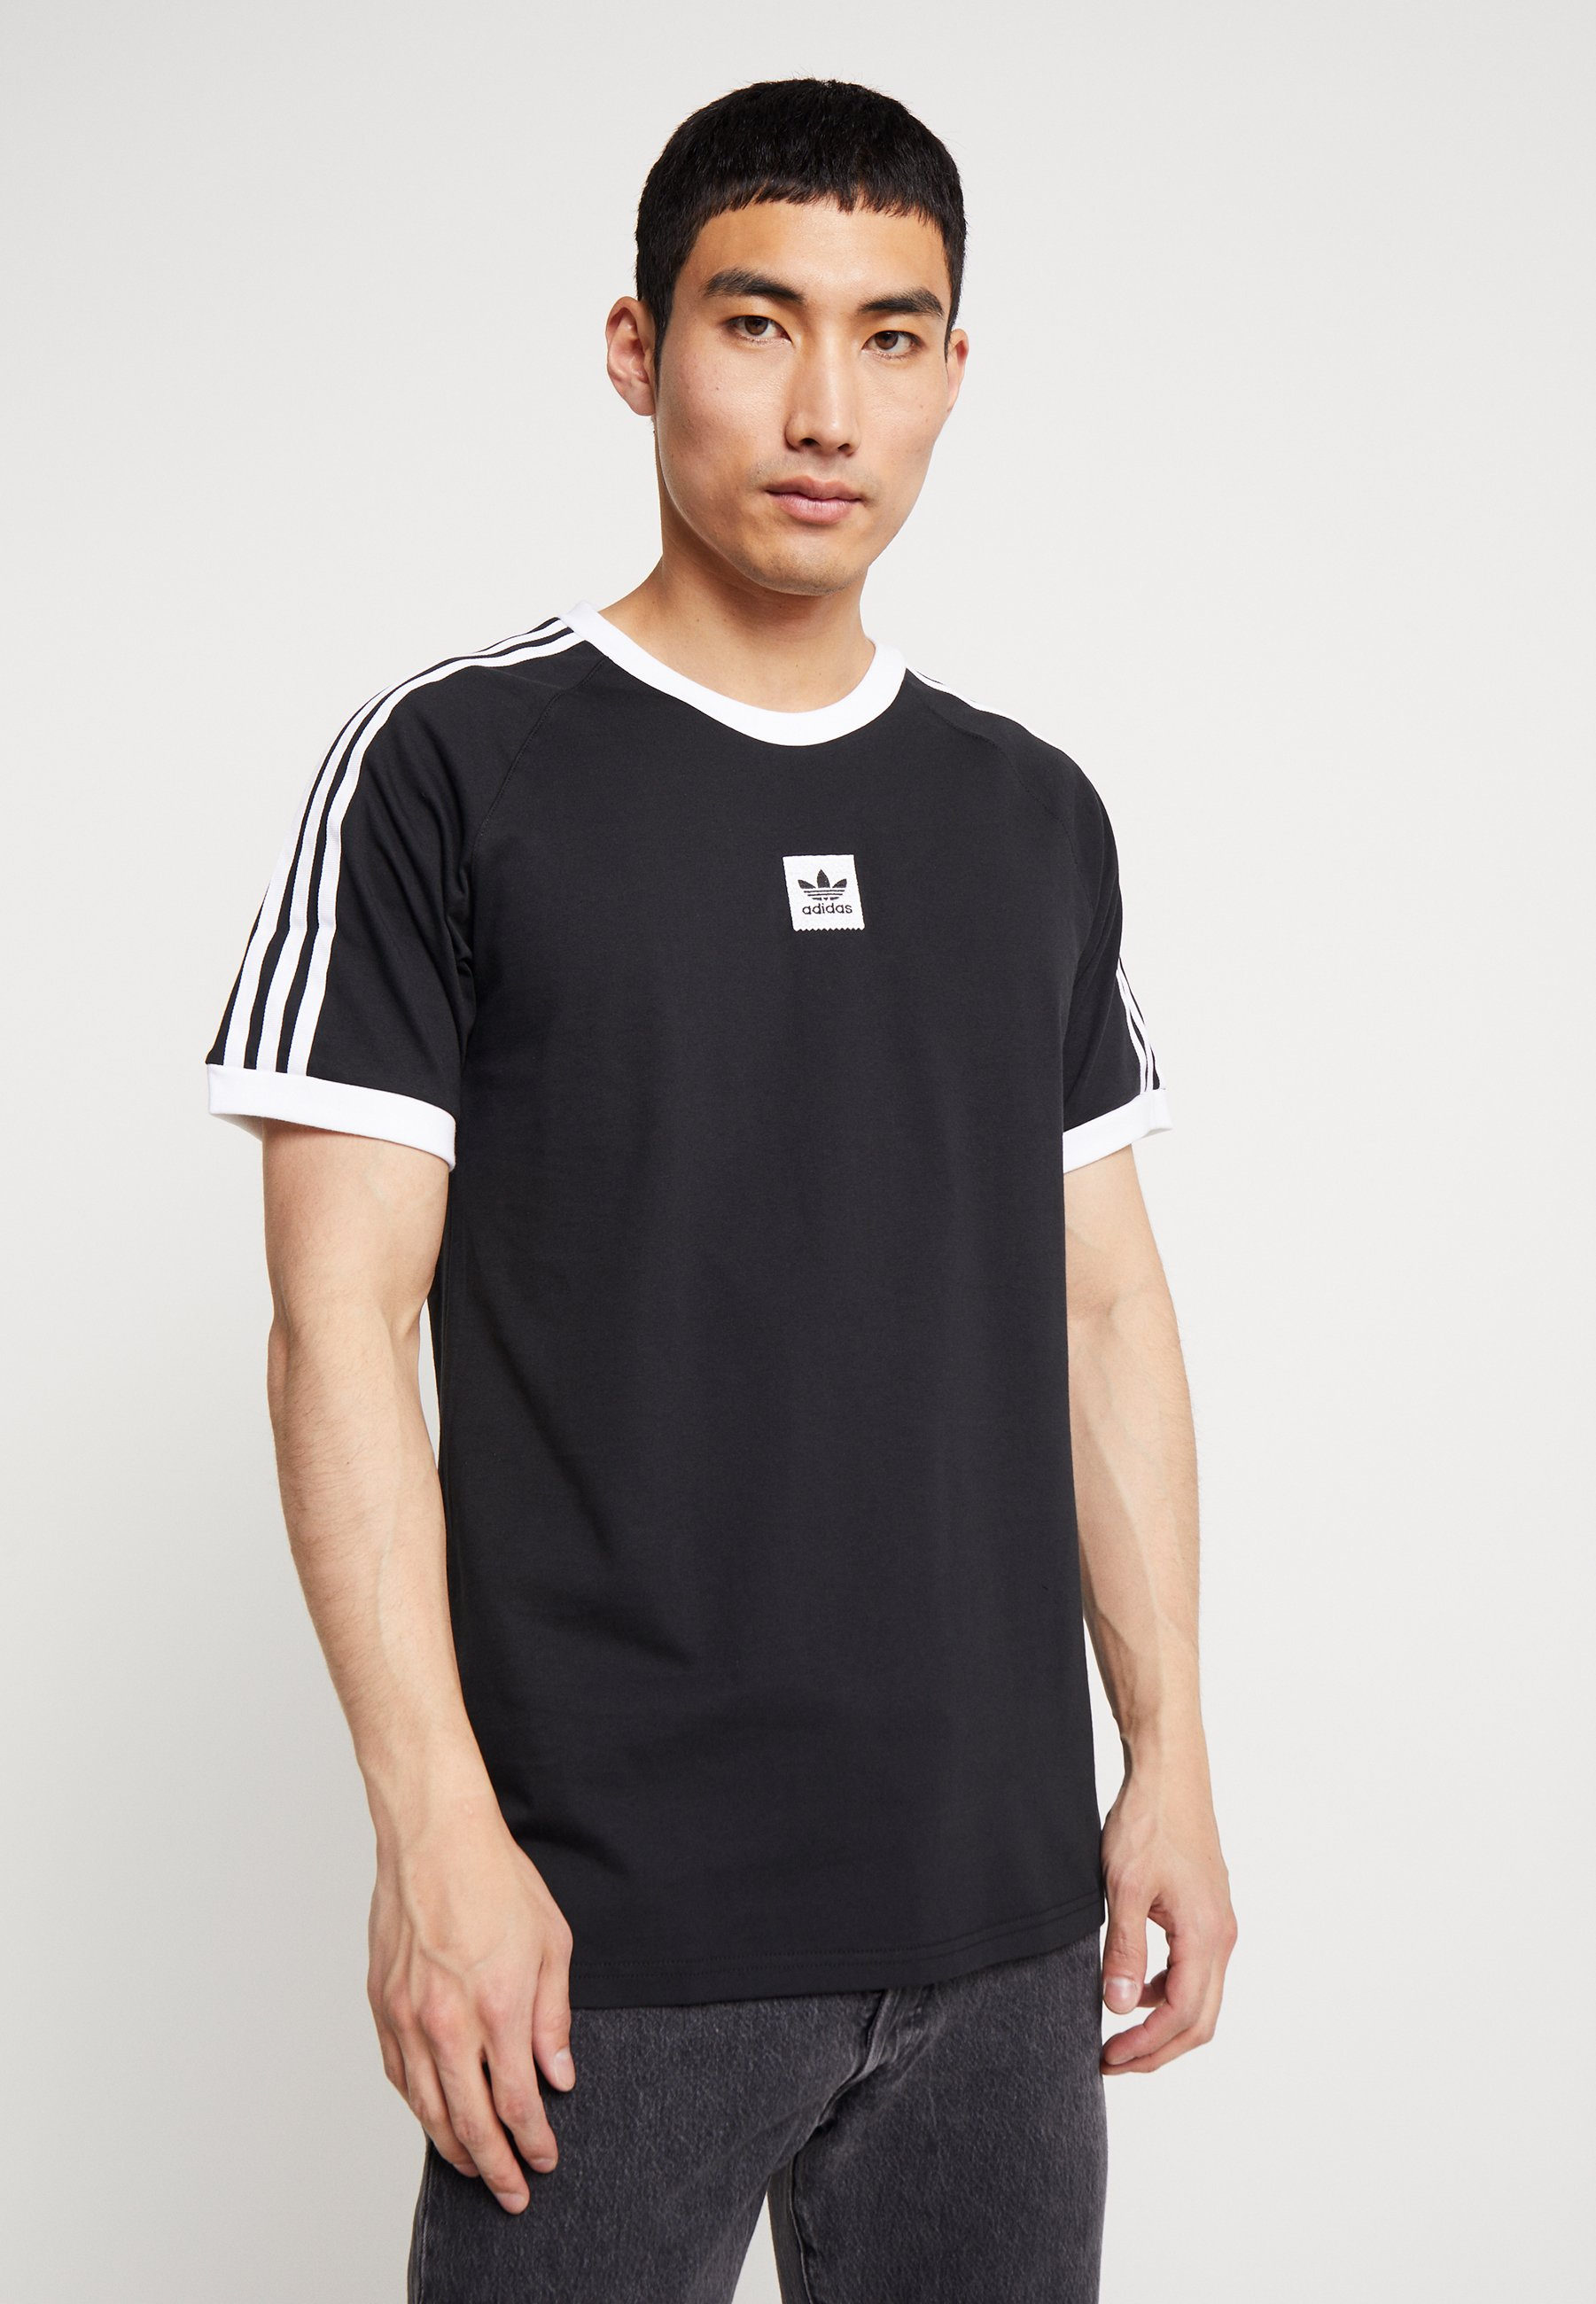 Imprimé Originals 2 Black Adidas Cali shirt TeeT 0 white kTuPXZwlOi